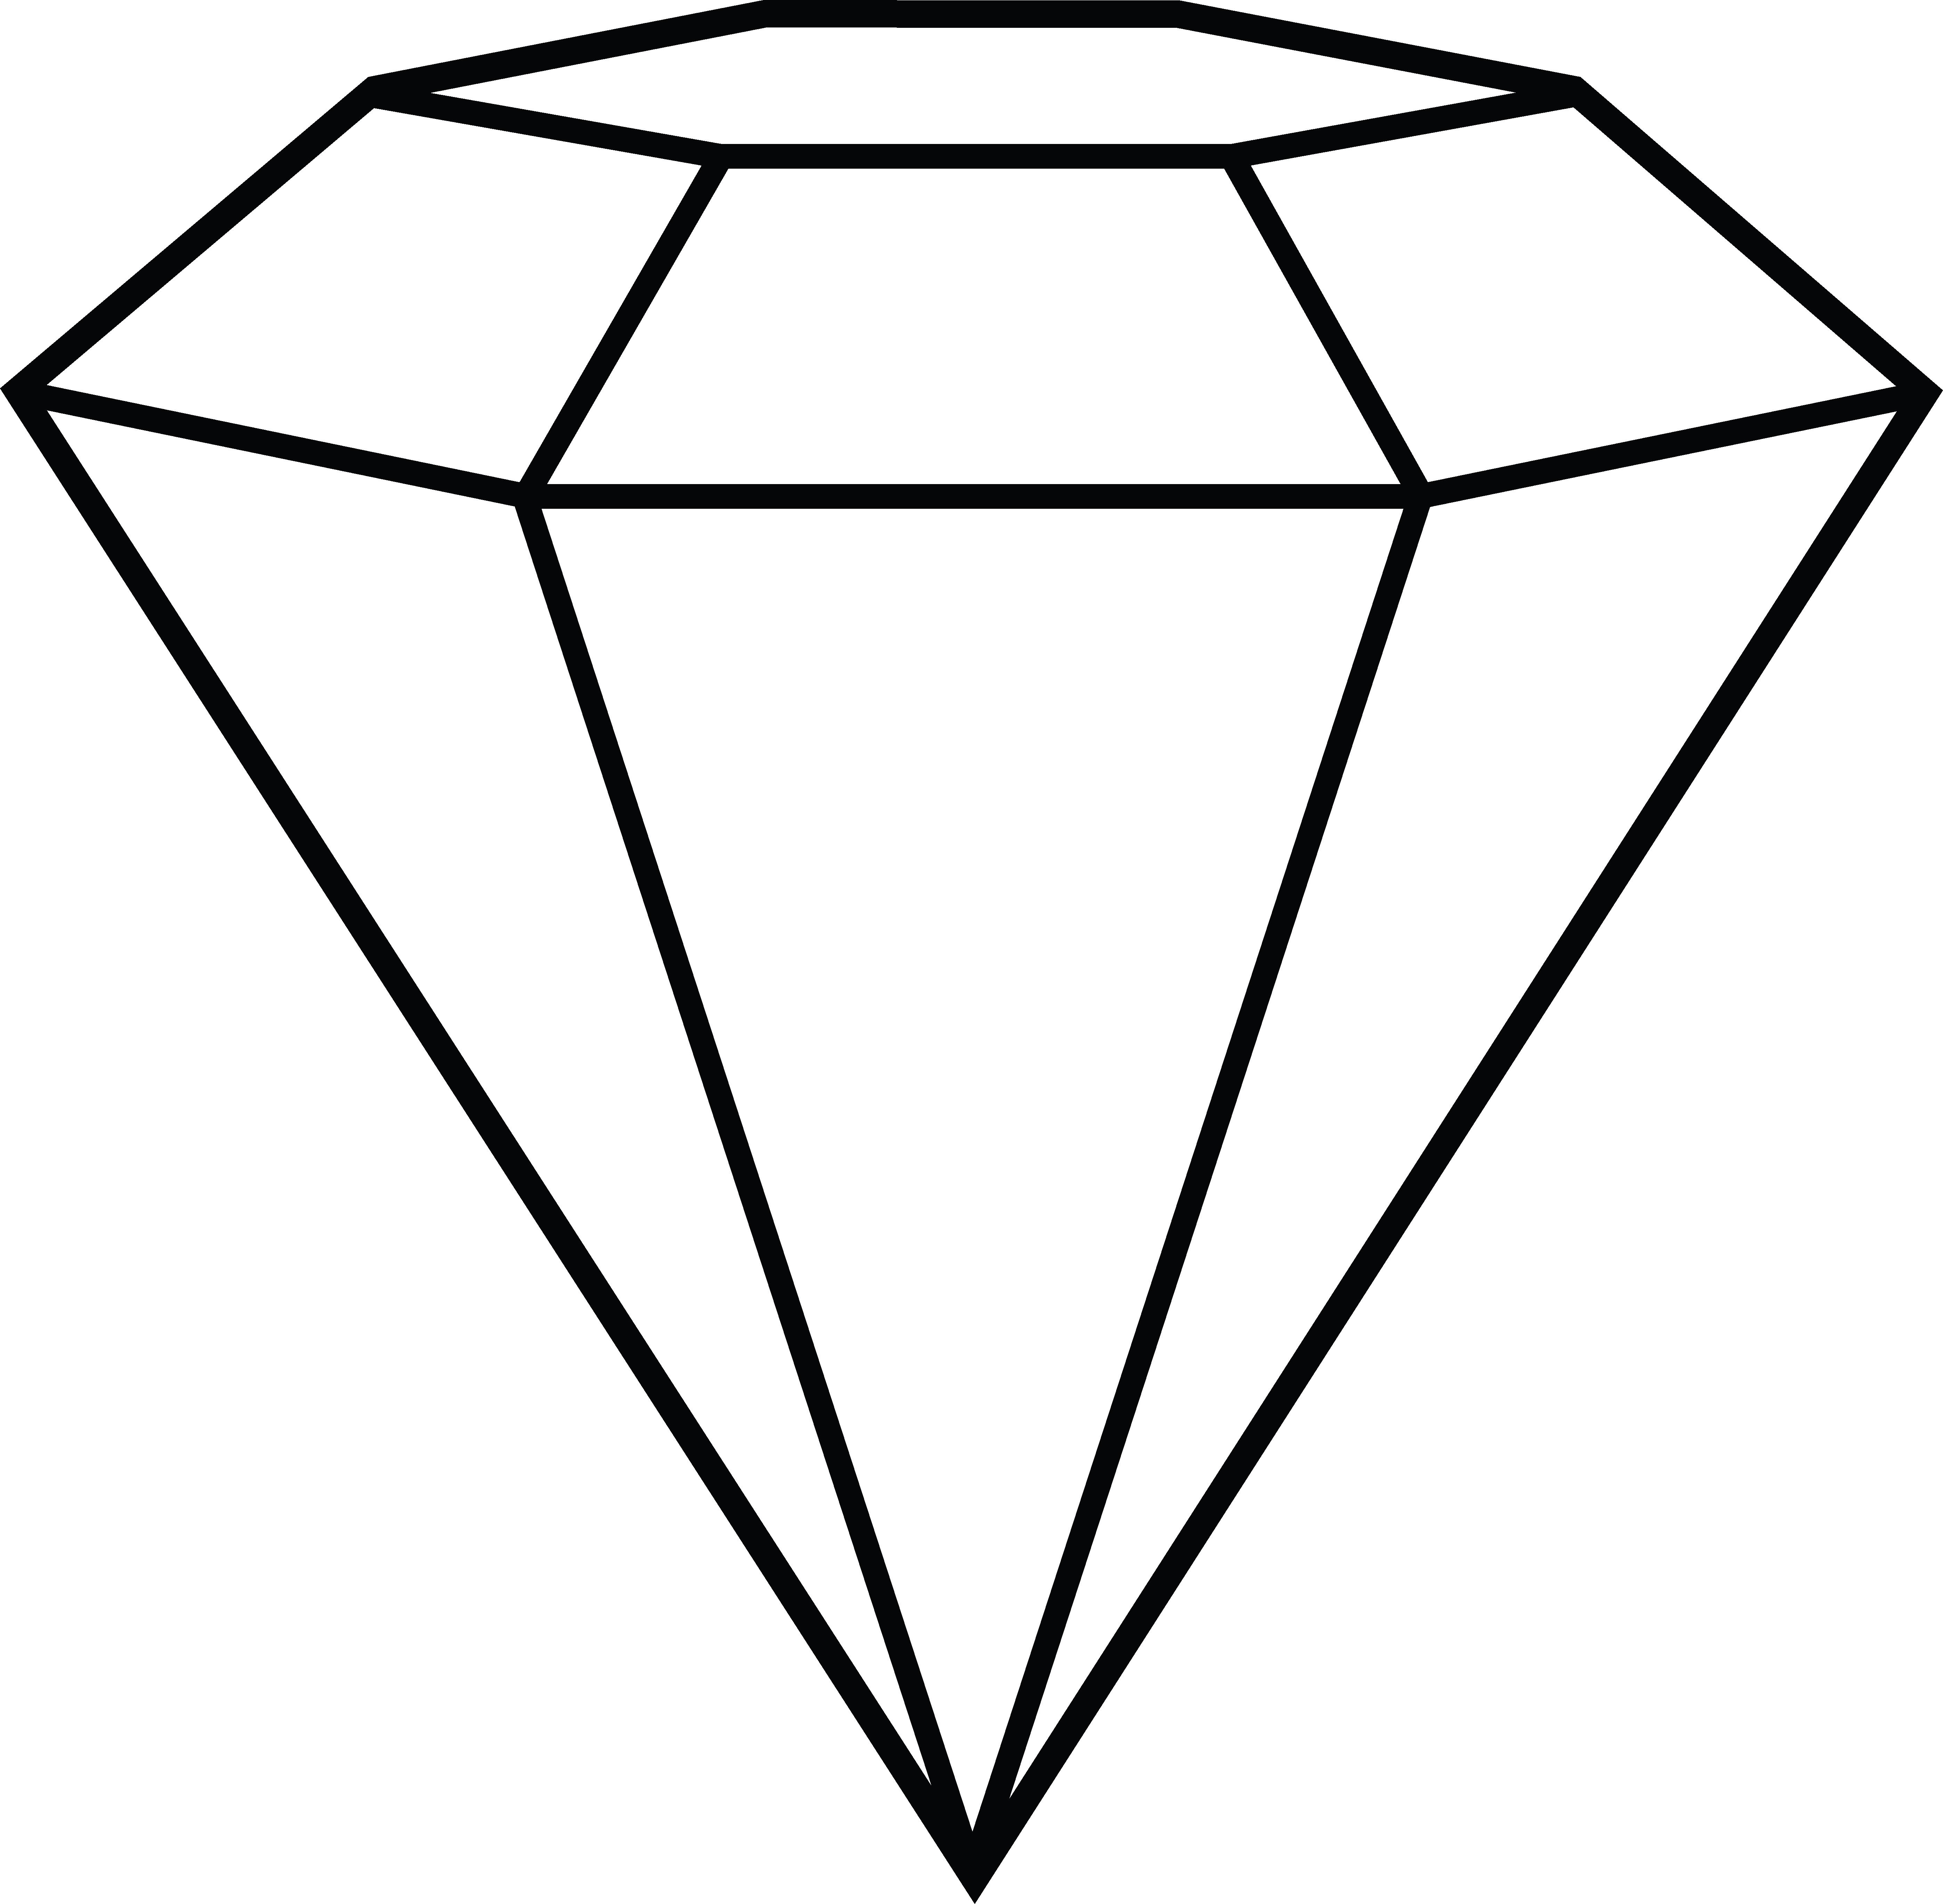 Graphic jokingart com download. Diamond clipart